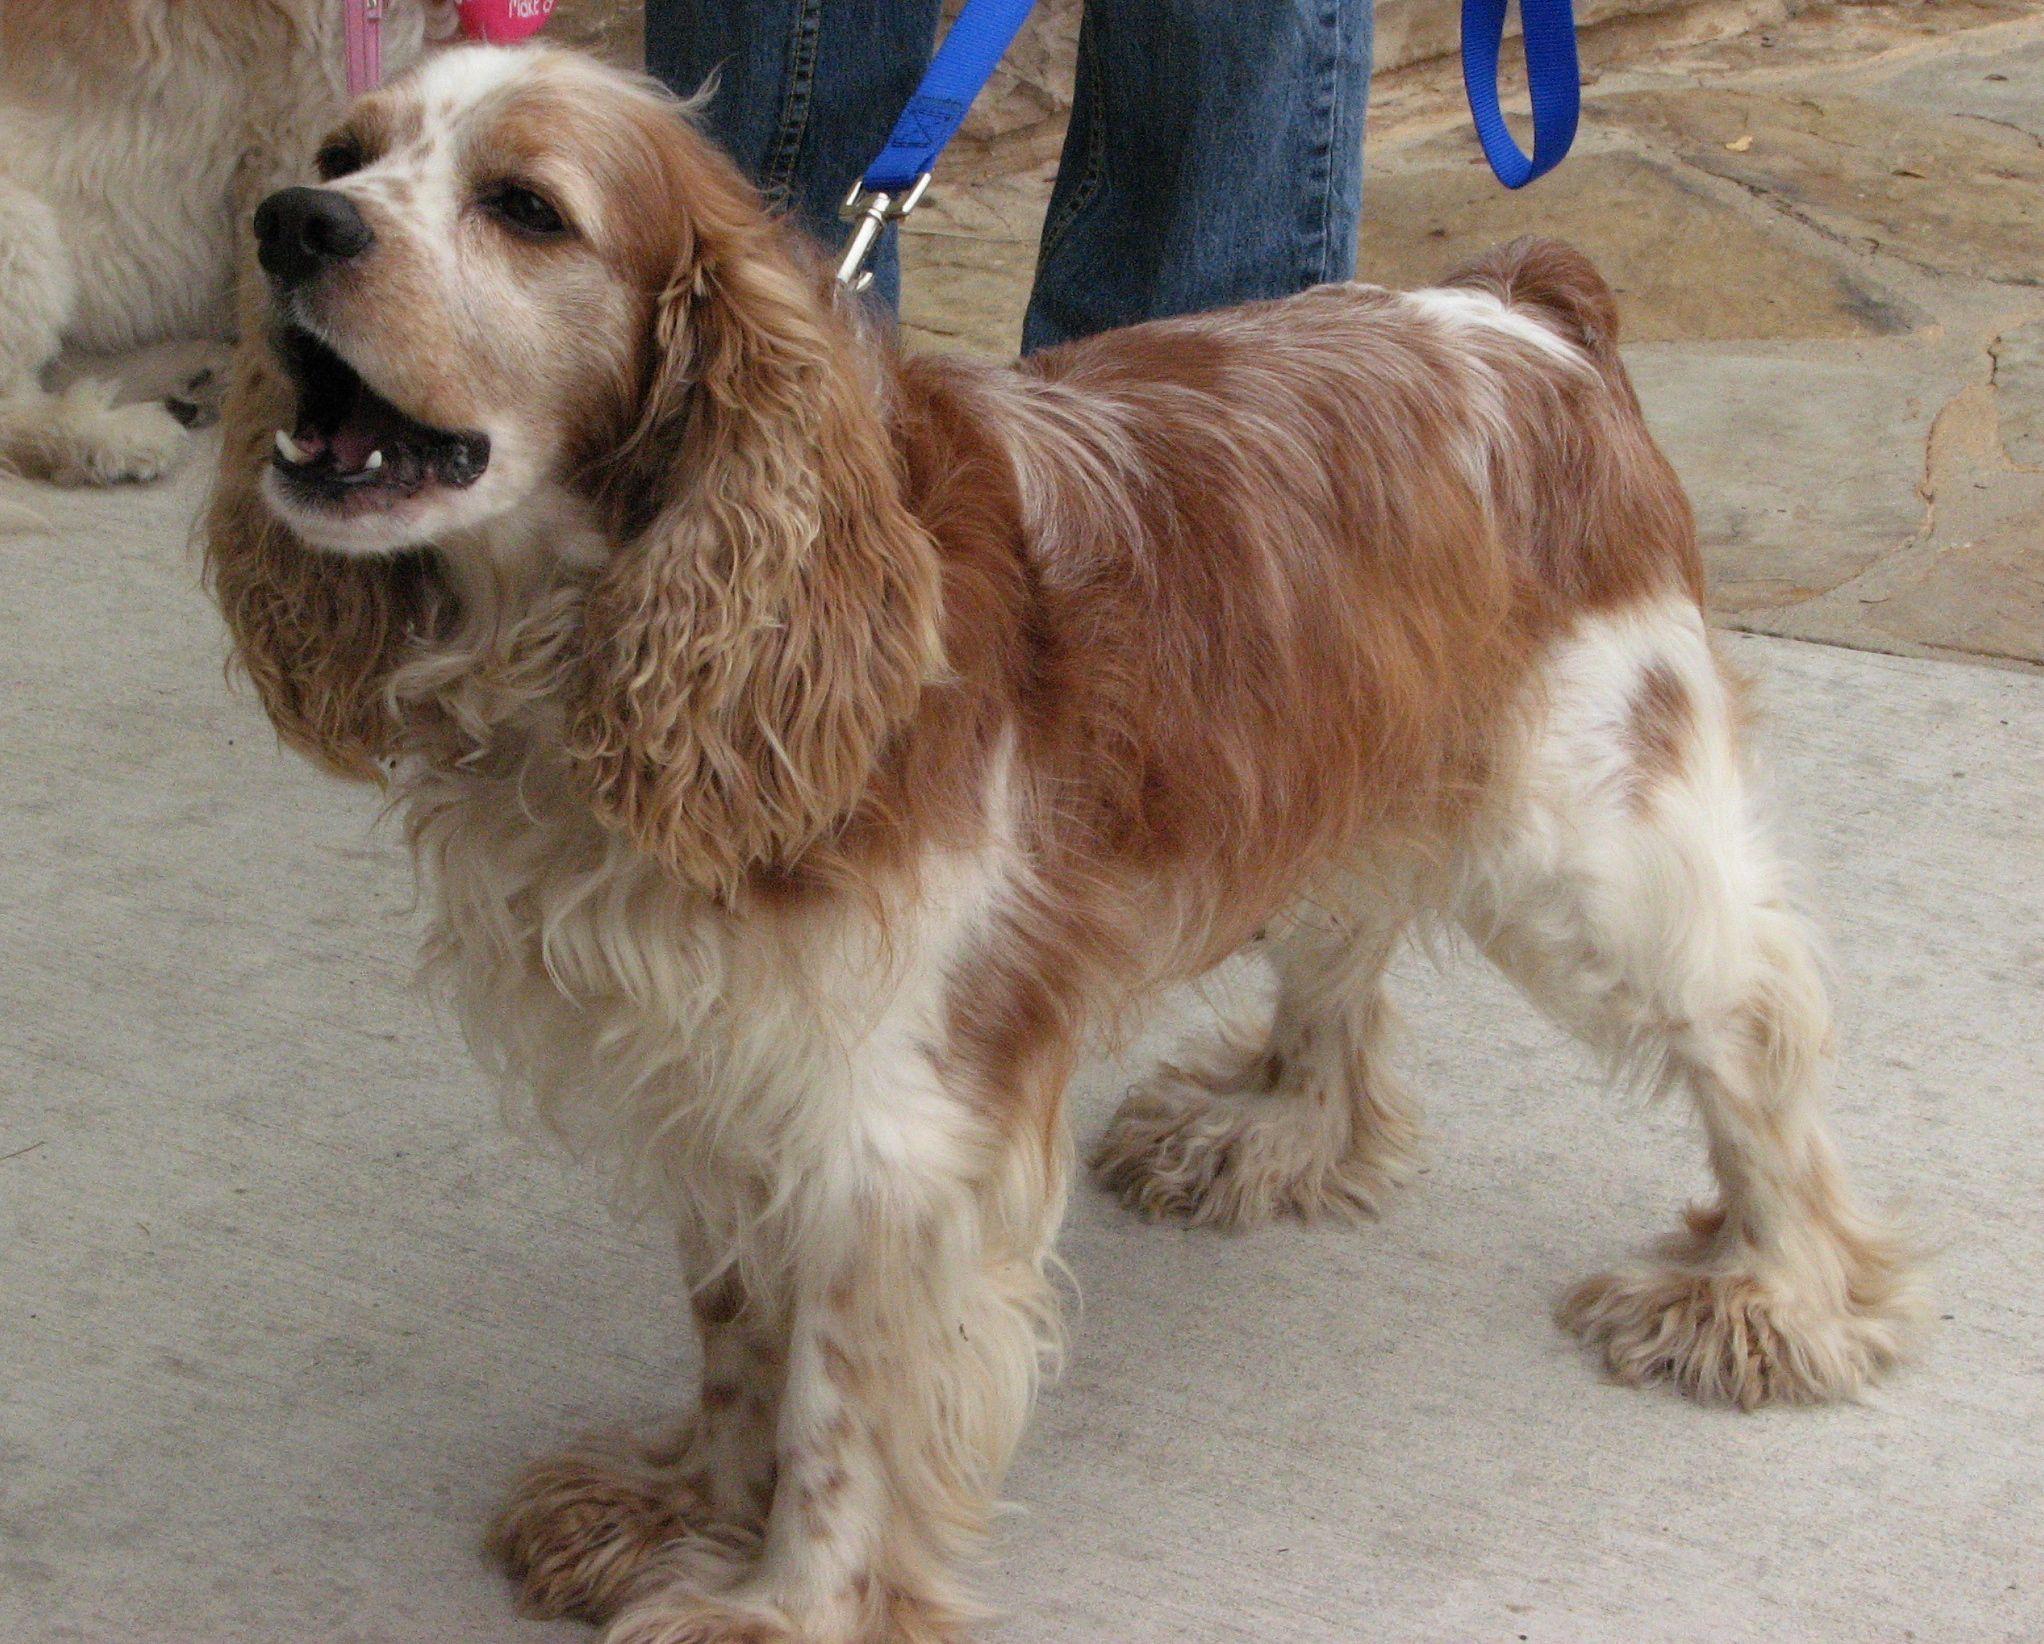 Shorty An Adoptable Cocker Spaniel In Austin Tx Www Austincockerrescue Org With Images Cocker Spaniel Dog Adoption Spaniel